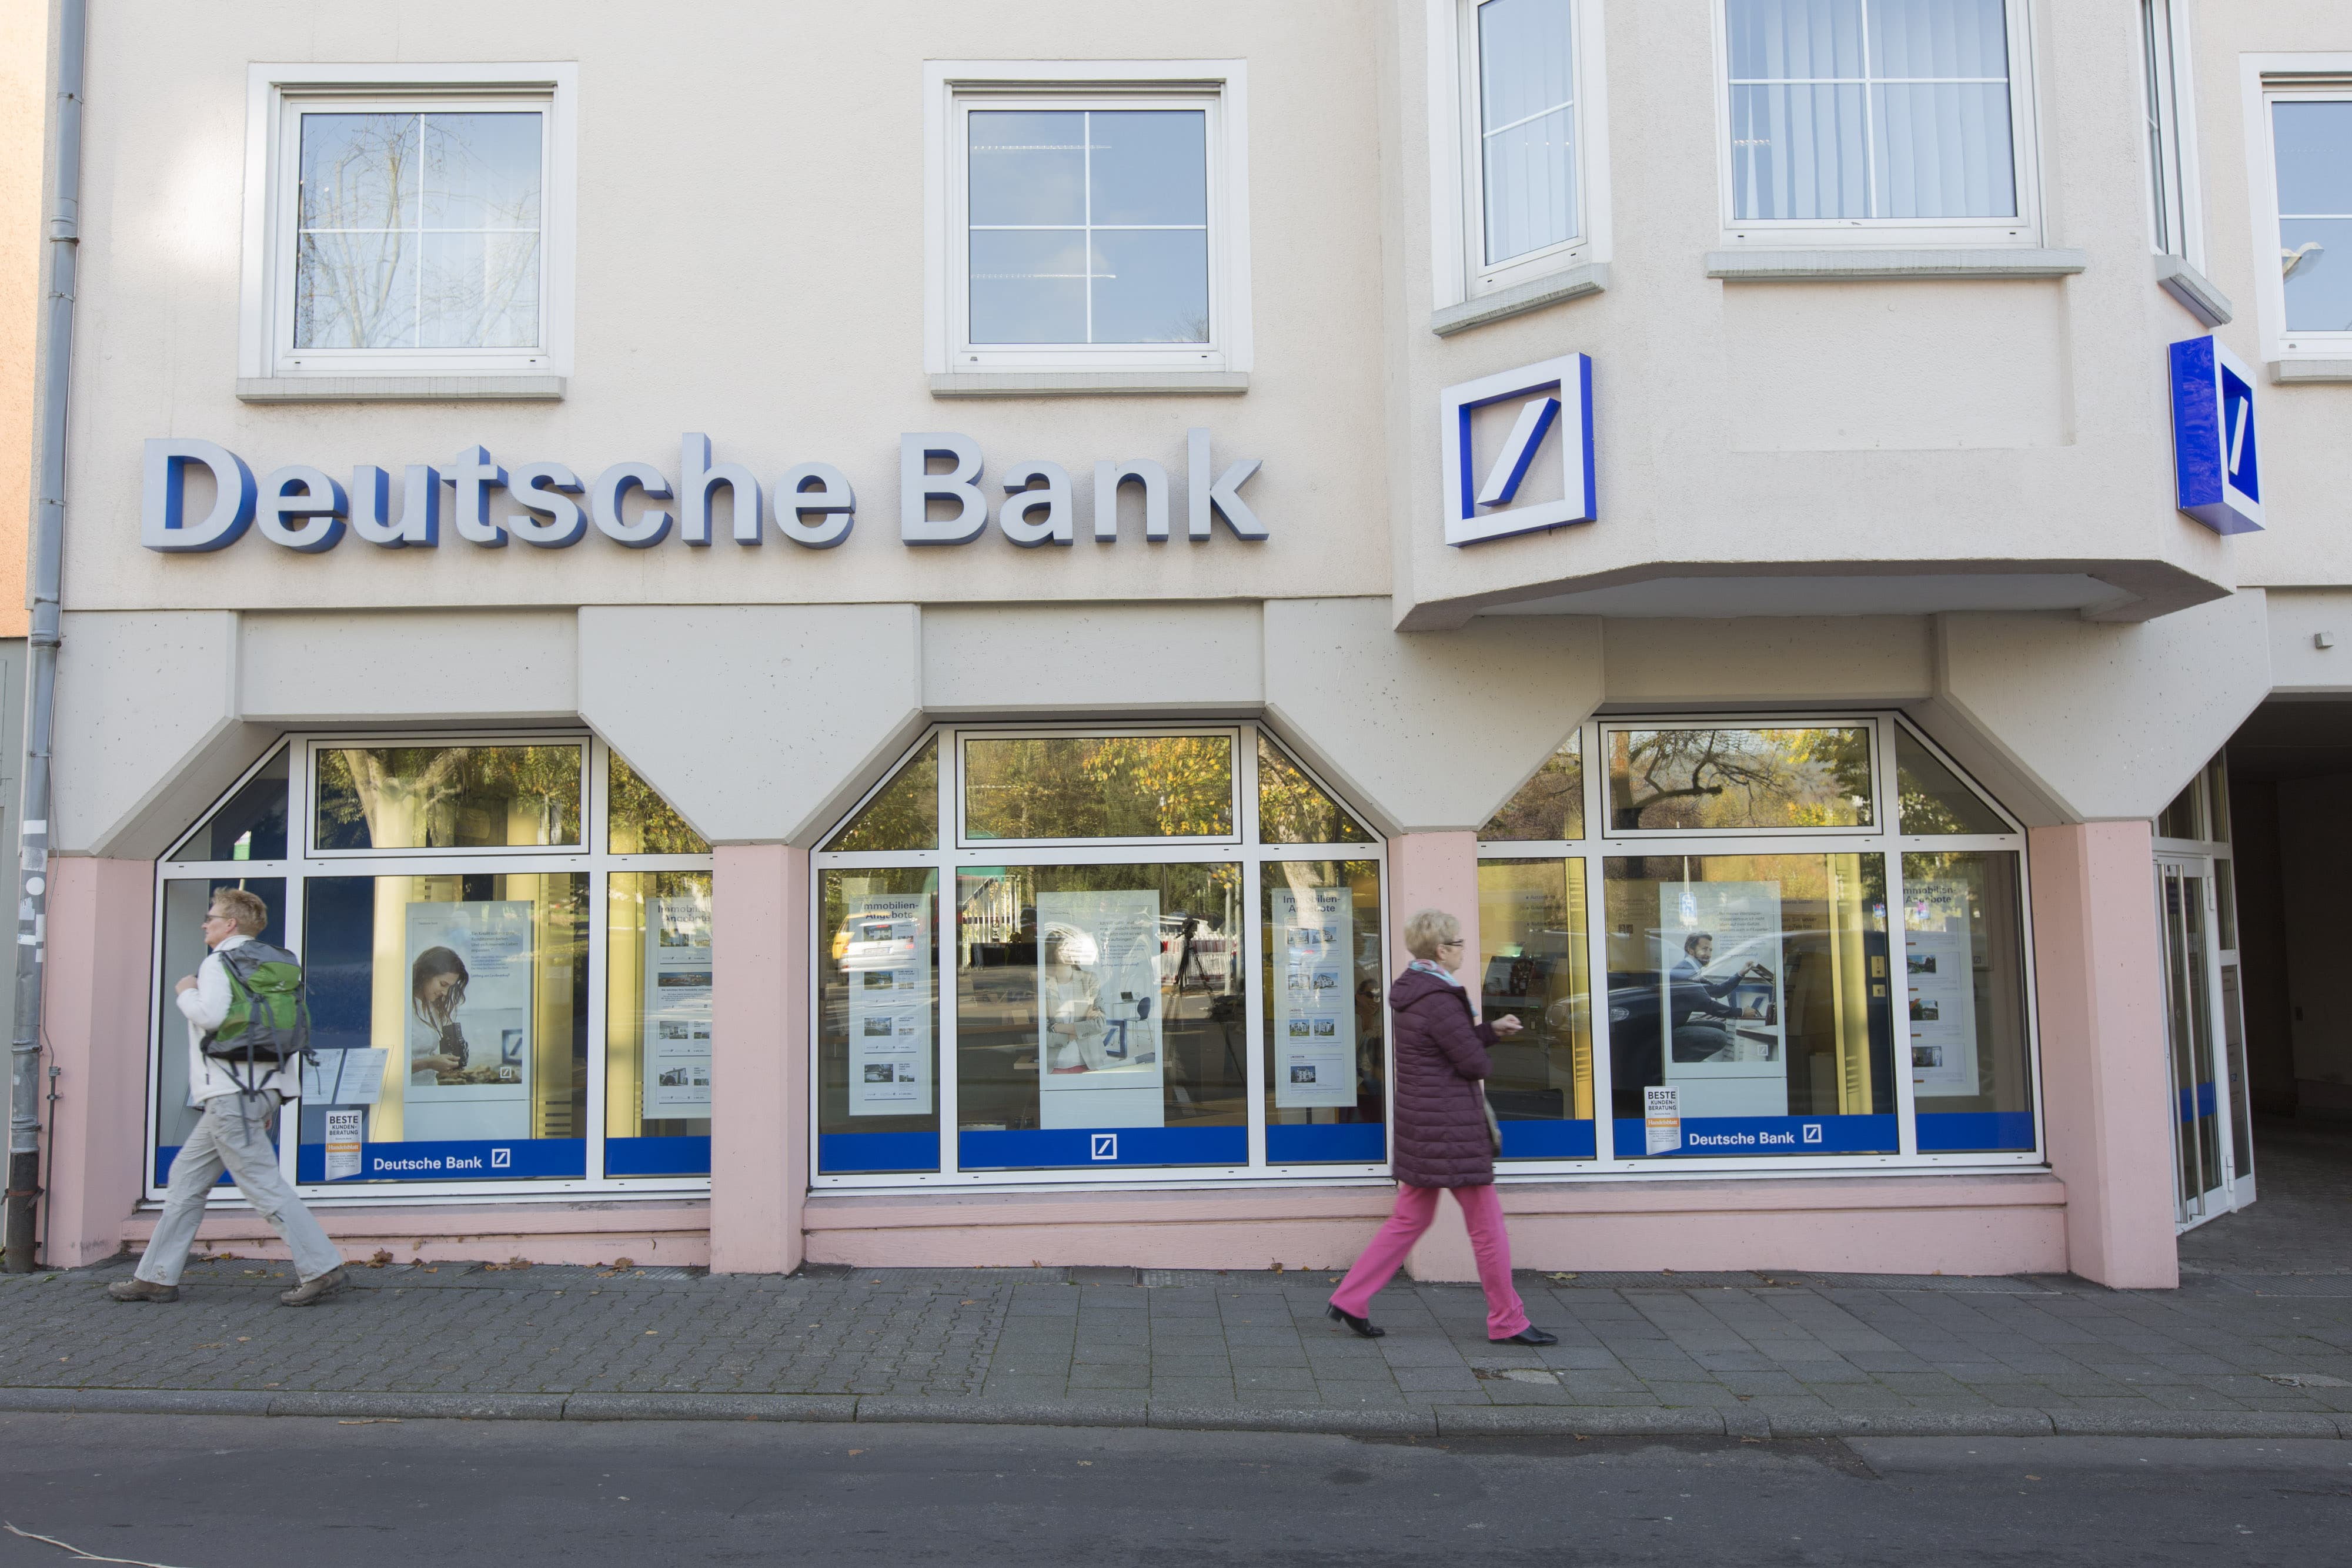 Deutsche Bank to Be Charged With Manipulating its Autobahn FX Platform